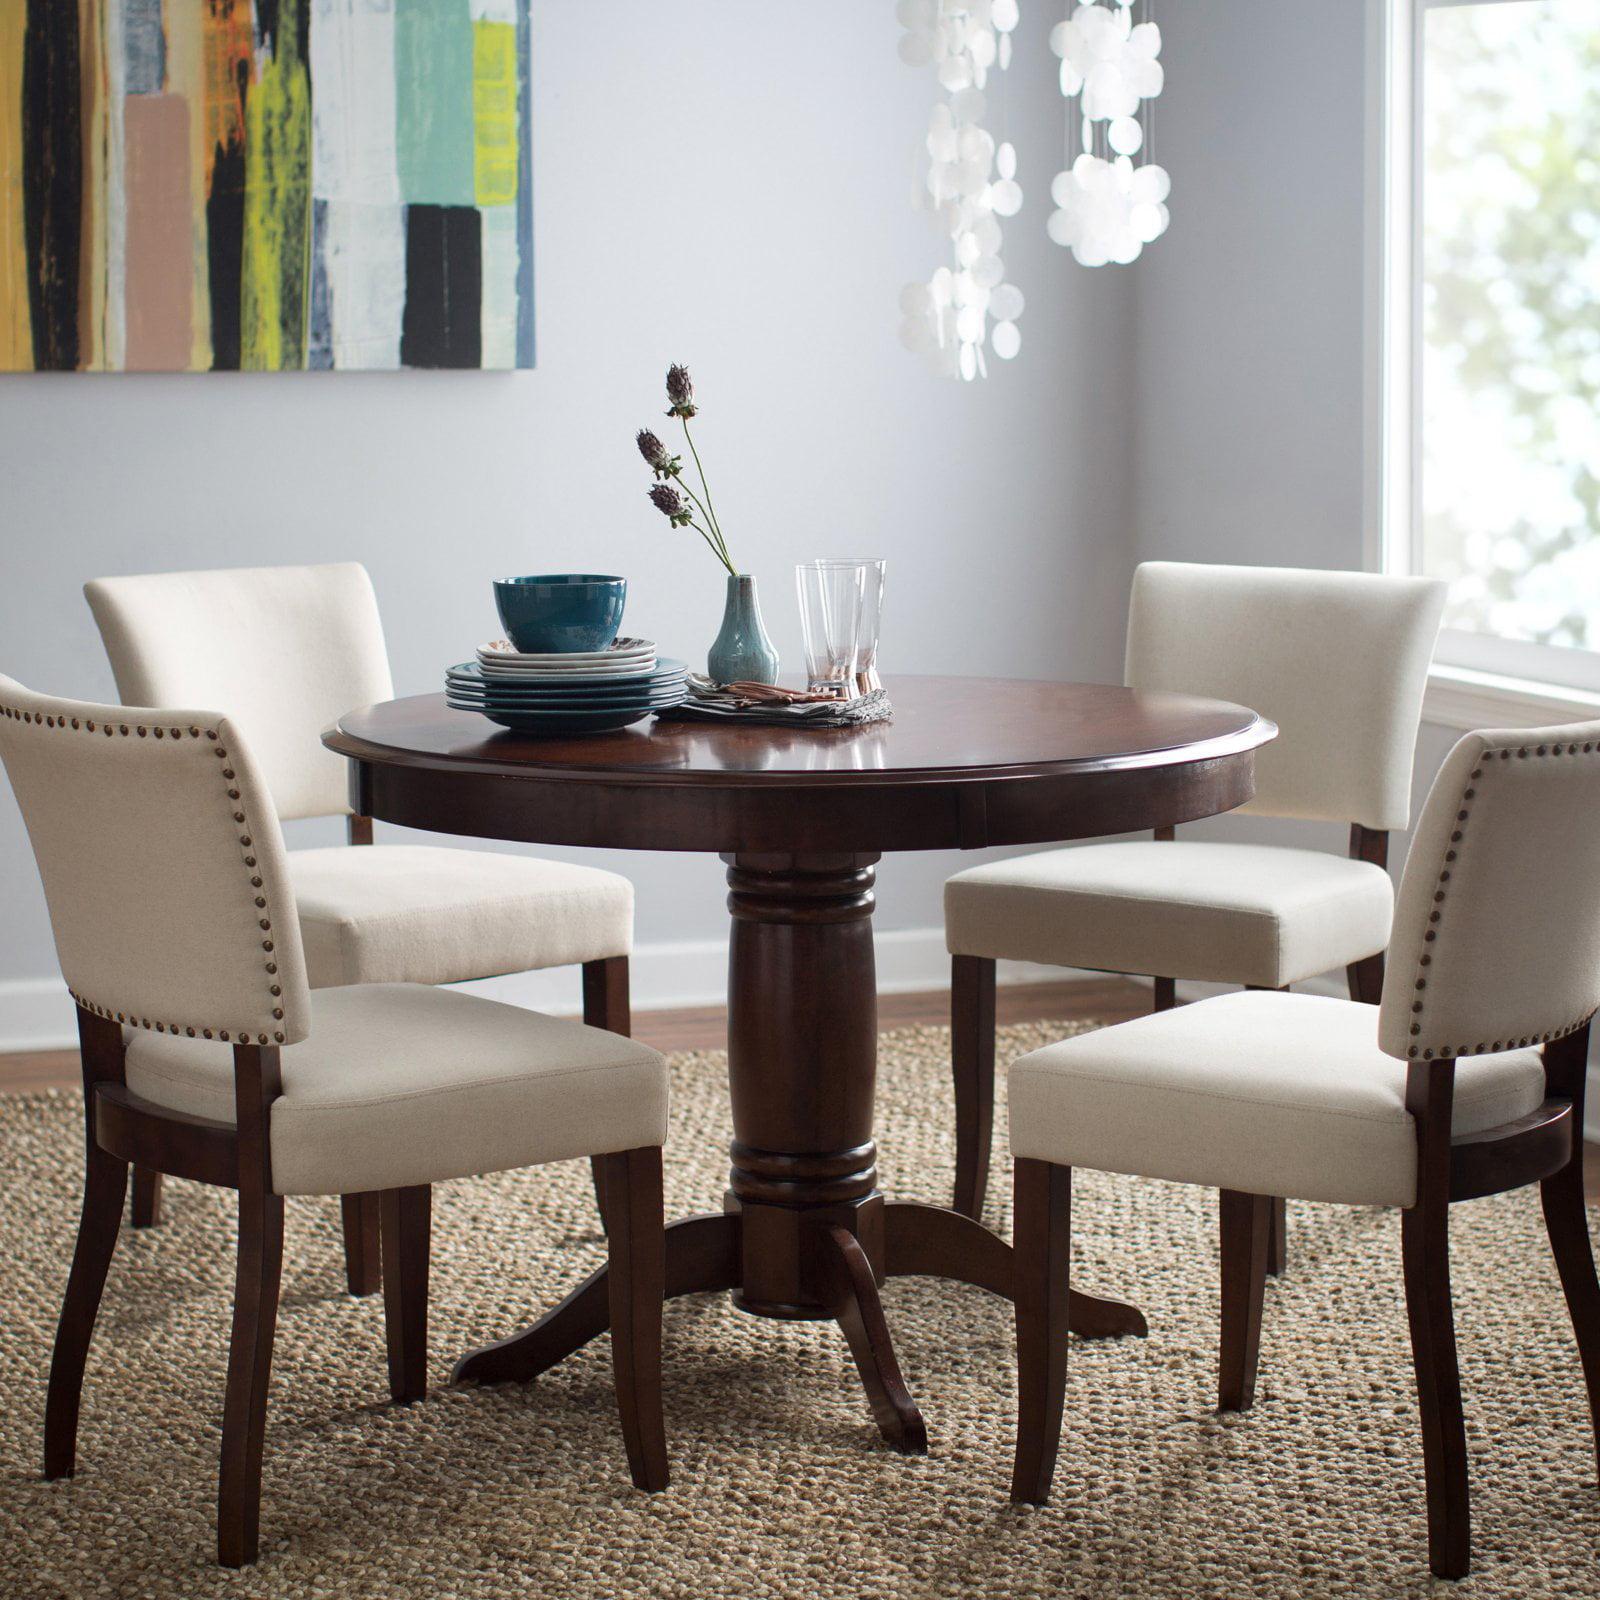 Belham Living Spencer Round Pedestal Dining Table Espresso by